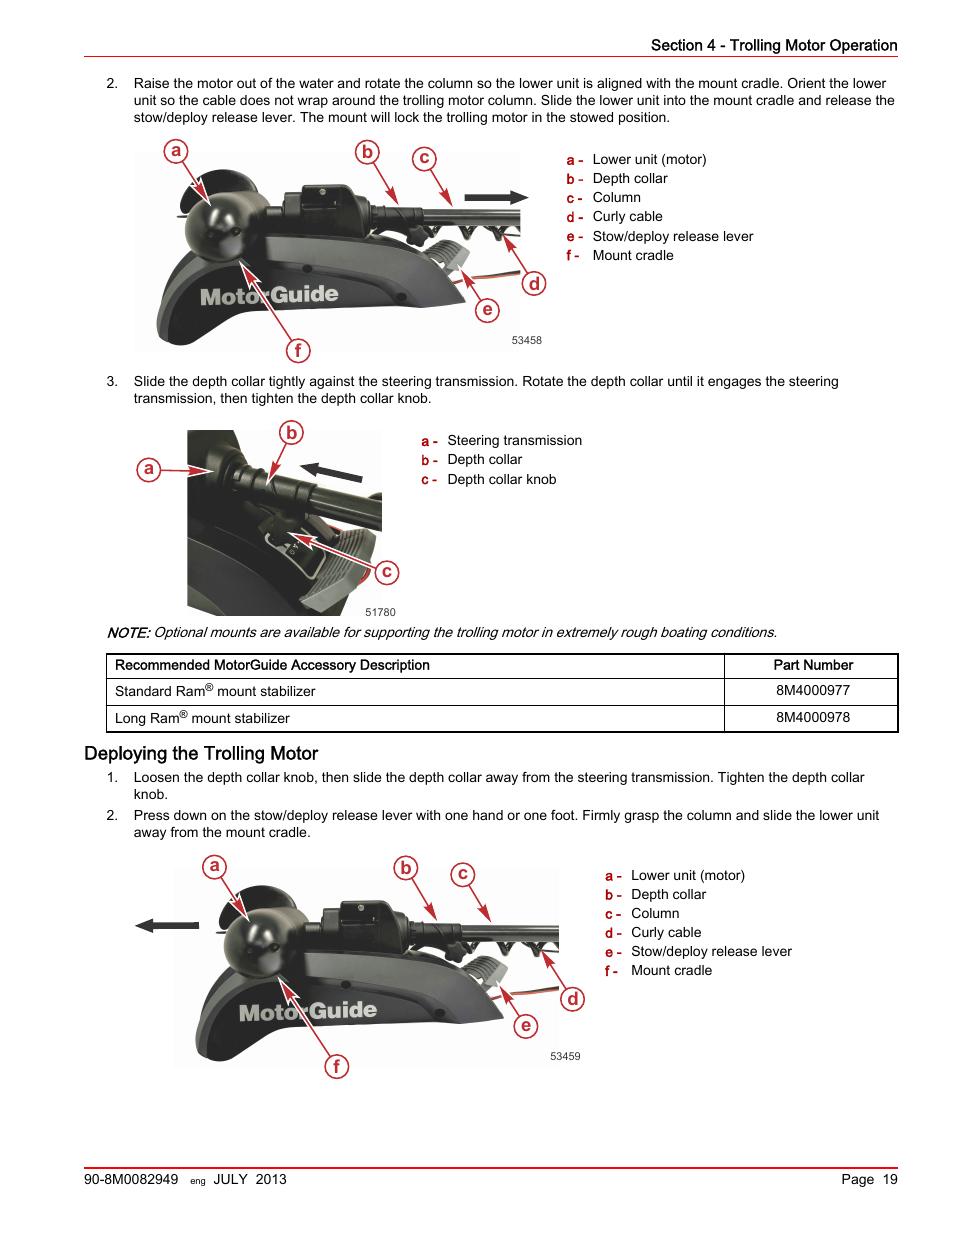 Wireless Trolling Motor Diagram Easy Rules Of Wiring Evinrude Deploying The Ab D E F Ca C Motorguide Xi5 Rh Manualsdir Com 24 Volt